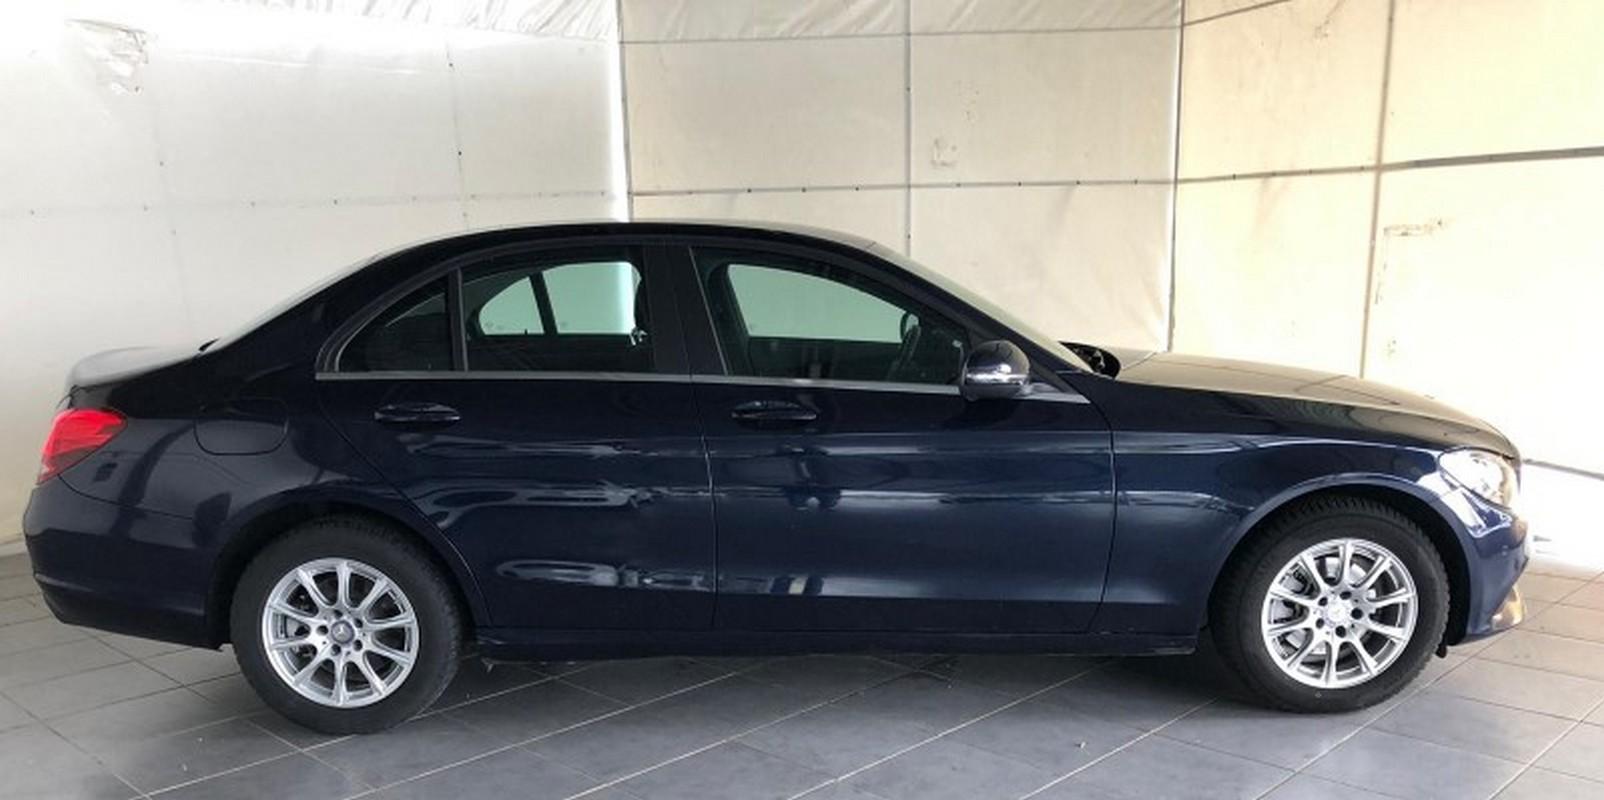 Mercedes-Benz Classe C 5